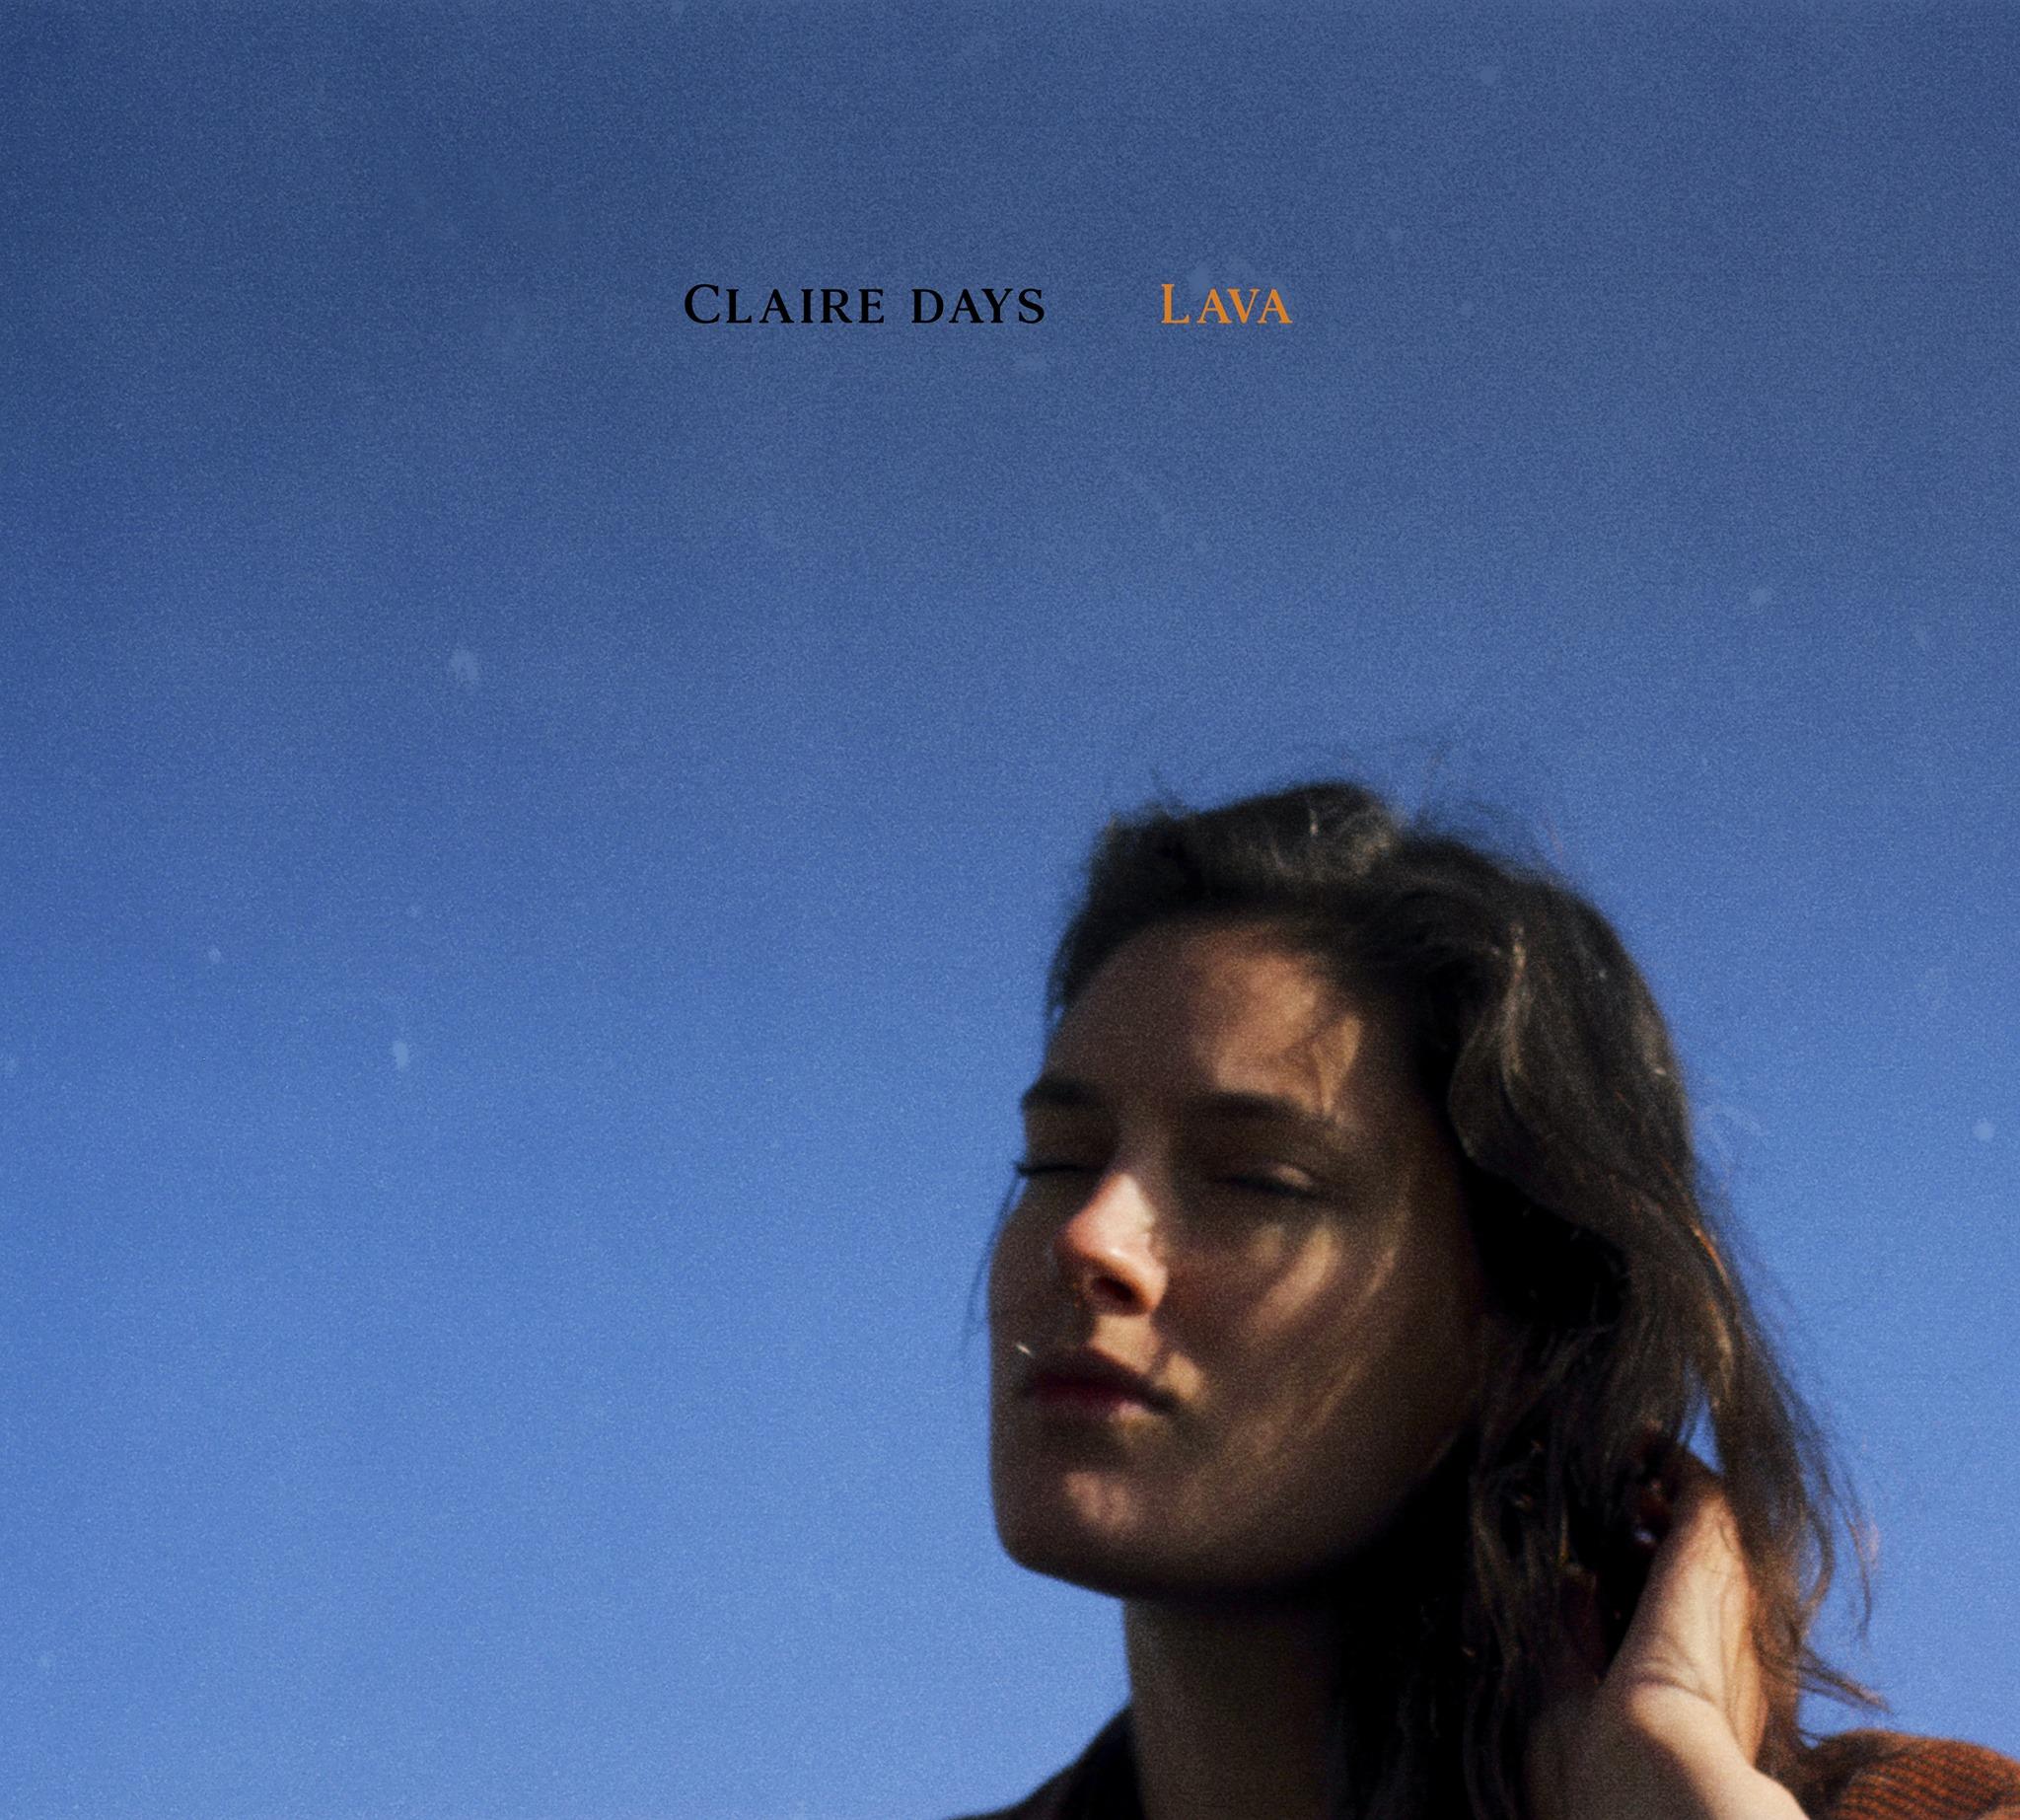 Lava - Claire Days